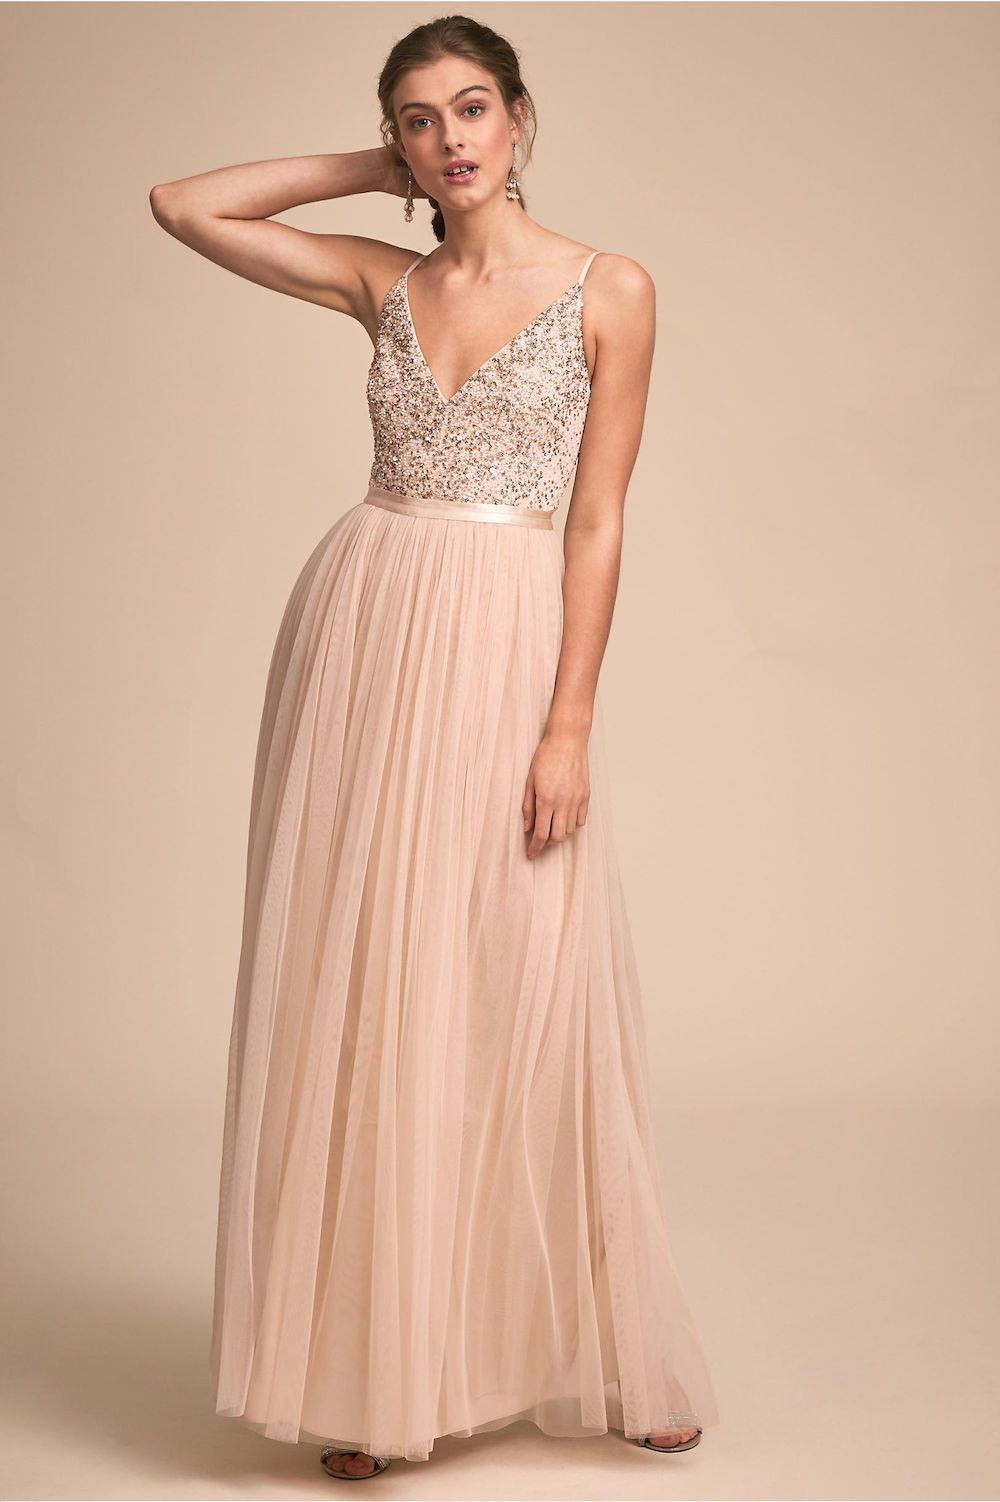 Edding Elegantly Chic Bhldn Bridesmaids Dresses | Stratadime